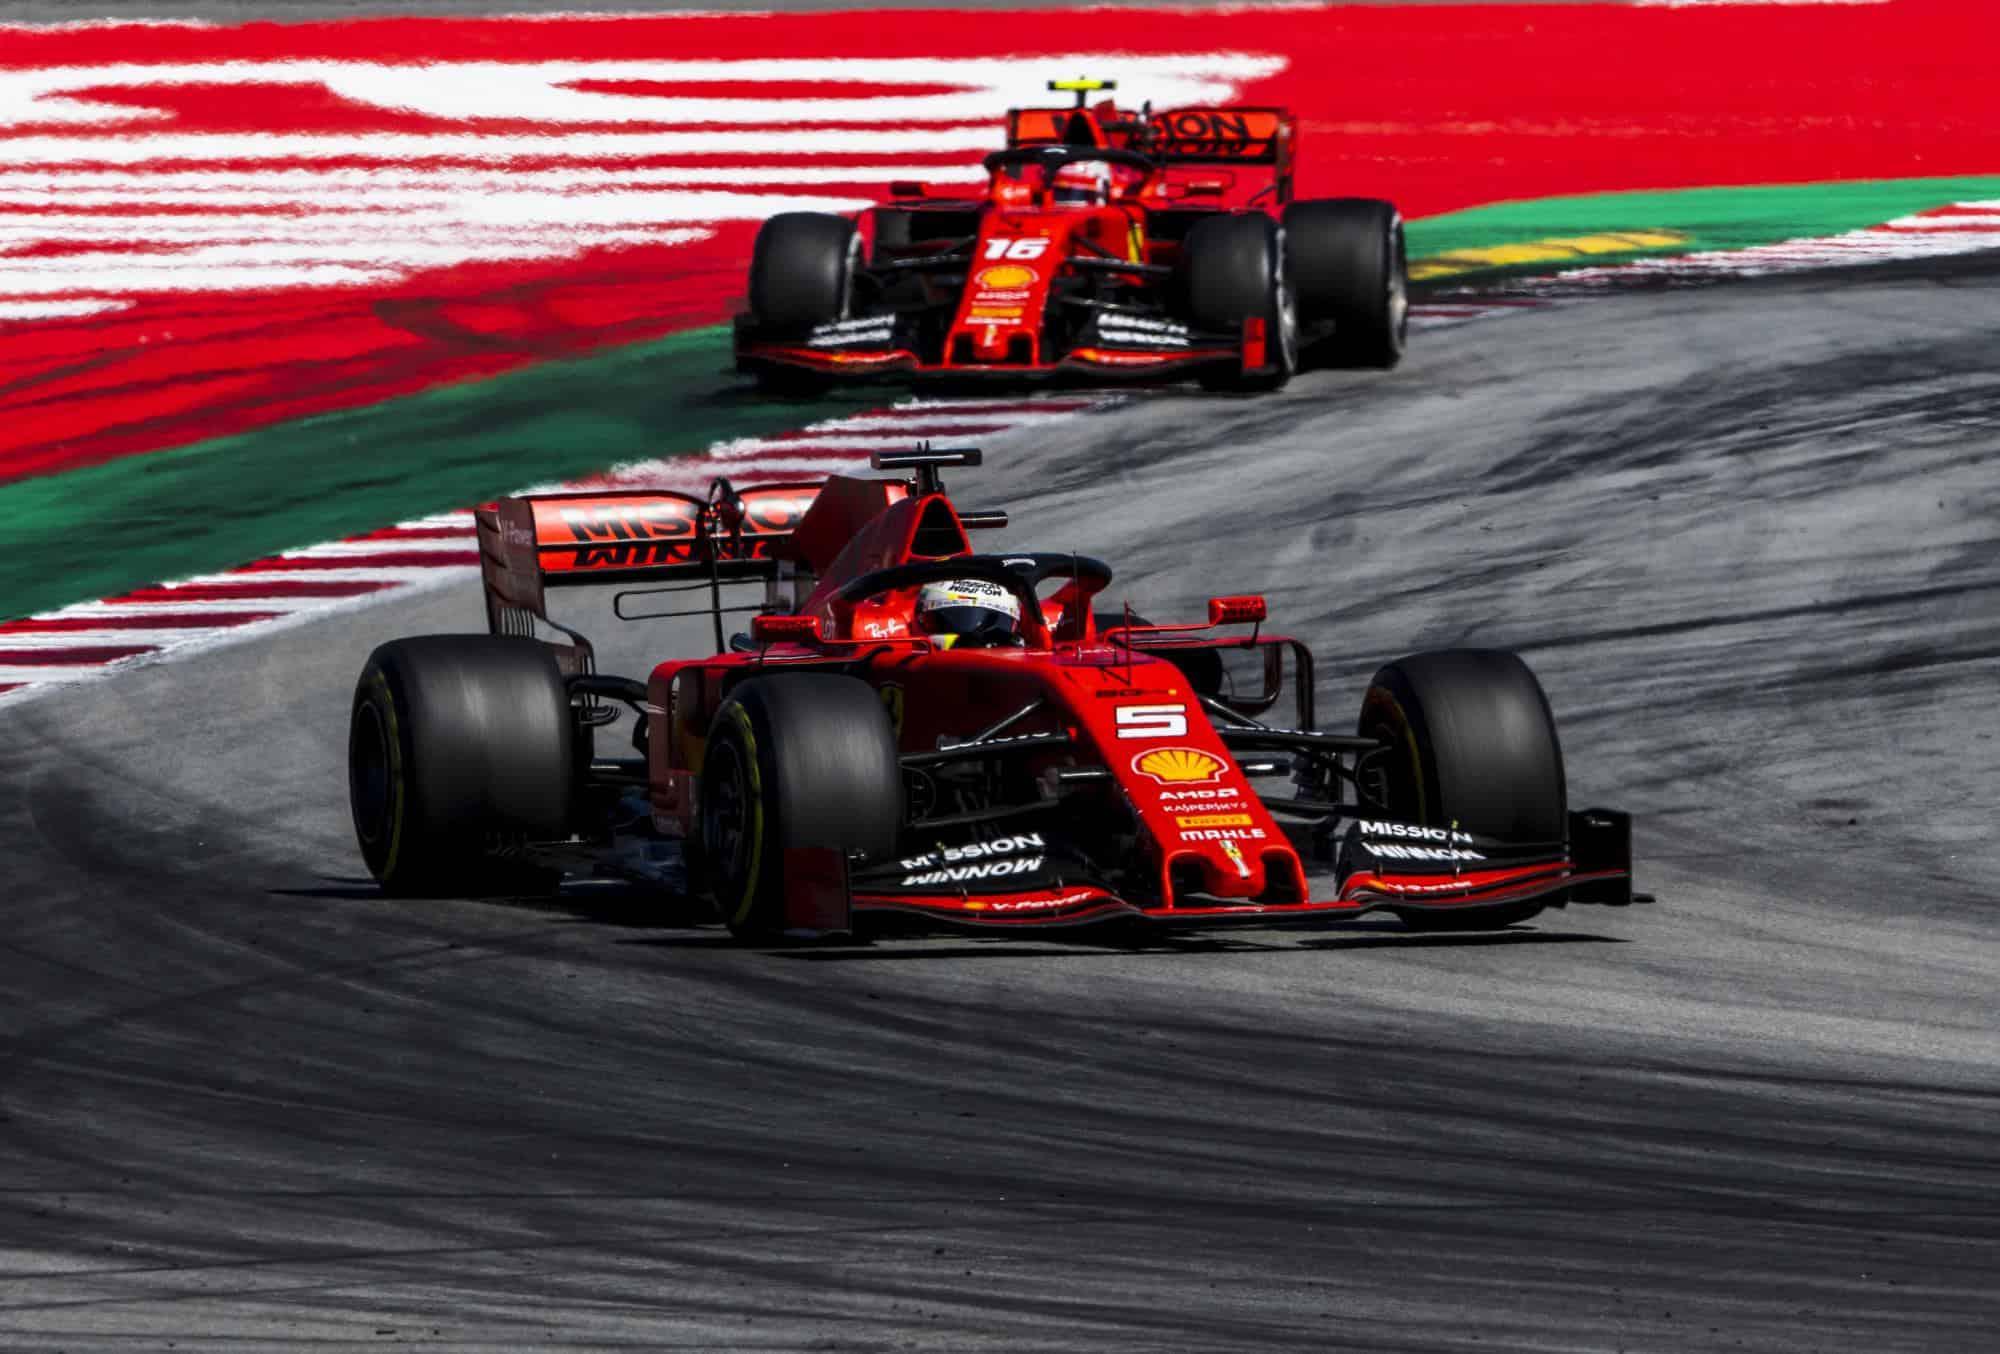 Vettel leads Leclerc Ferrari SF90 Spanish GP F1 2019 Photo Ferrari